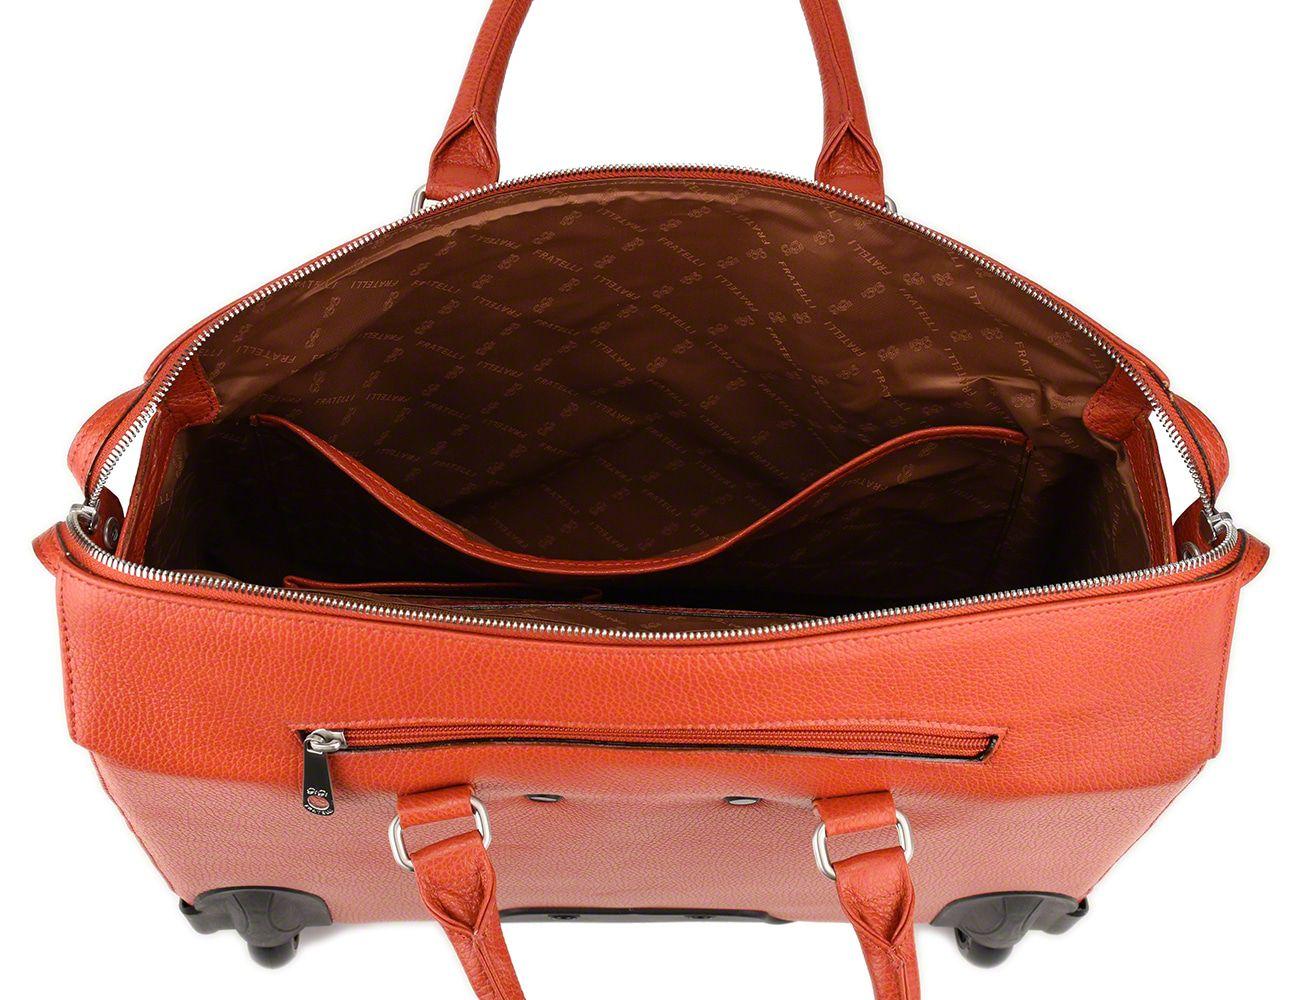 Trolley Gigi Fratelli Dames Leren Laptop Trolley 15.6 inch Romance Business ROM8015 Oranje